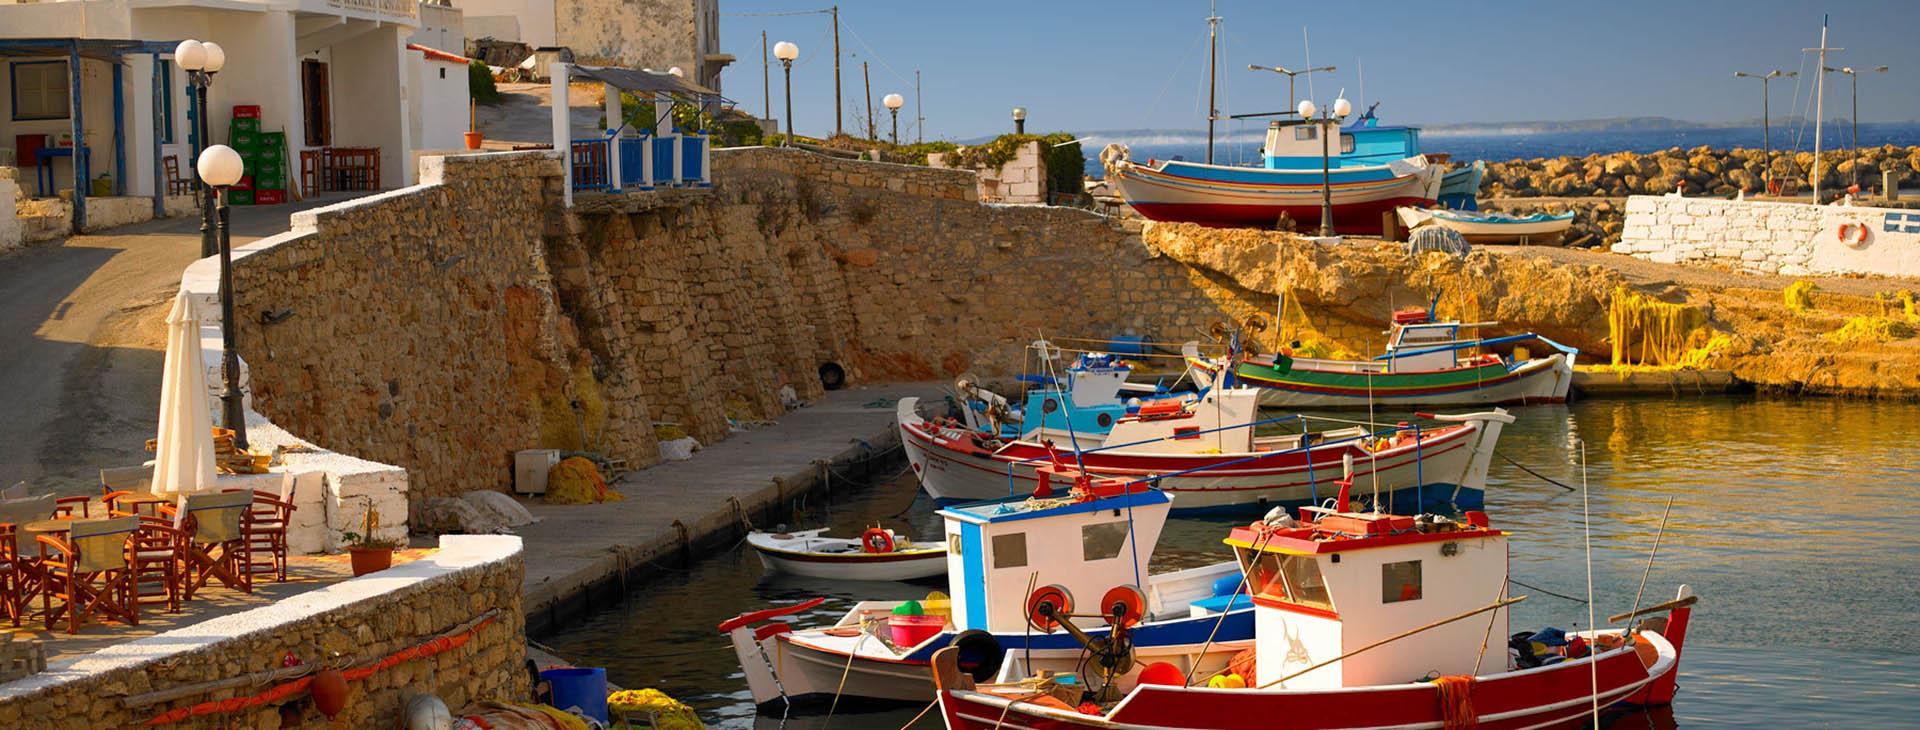 Bouka harbour, Kassos island